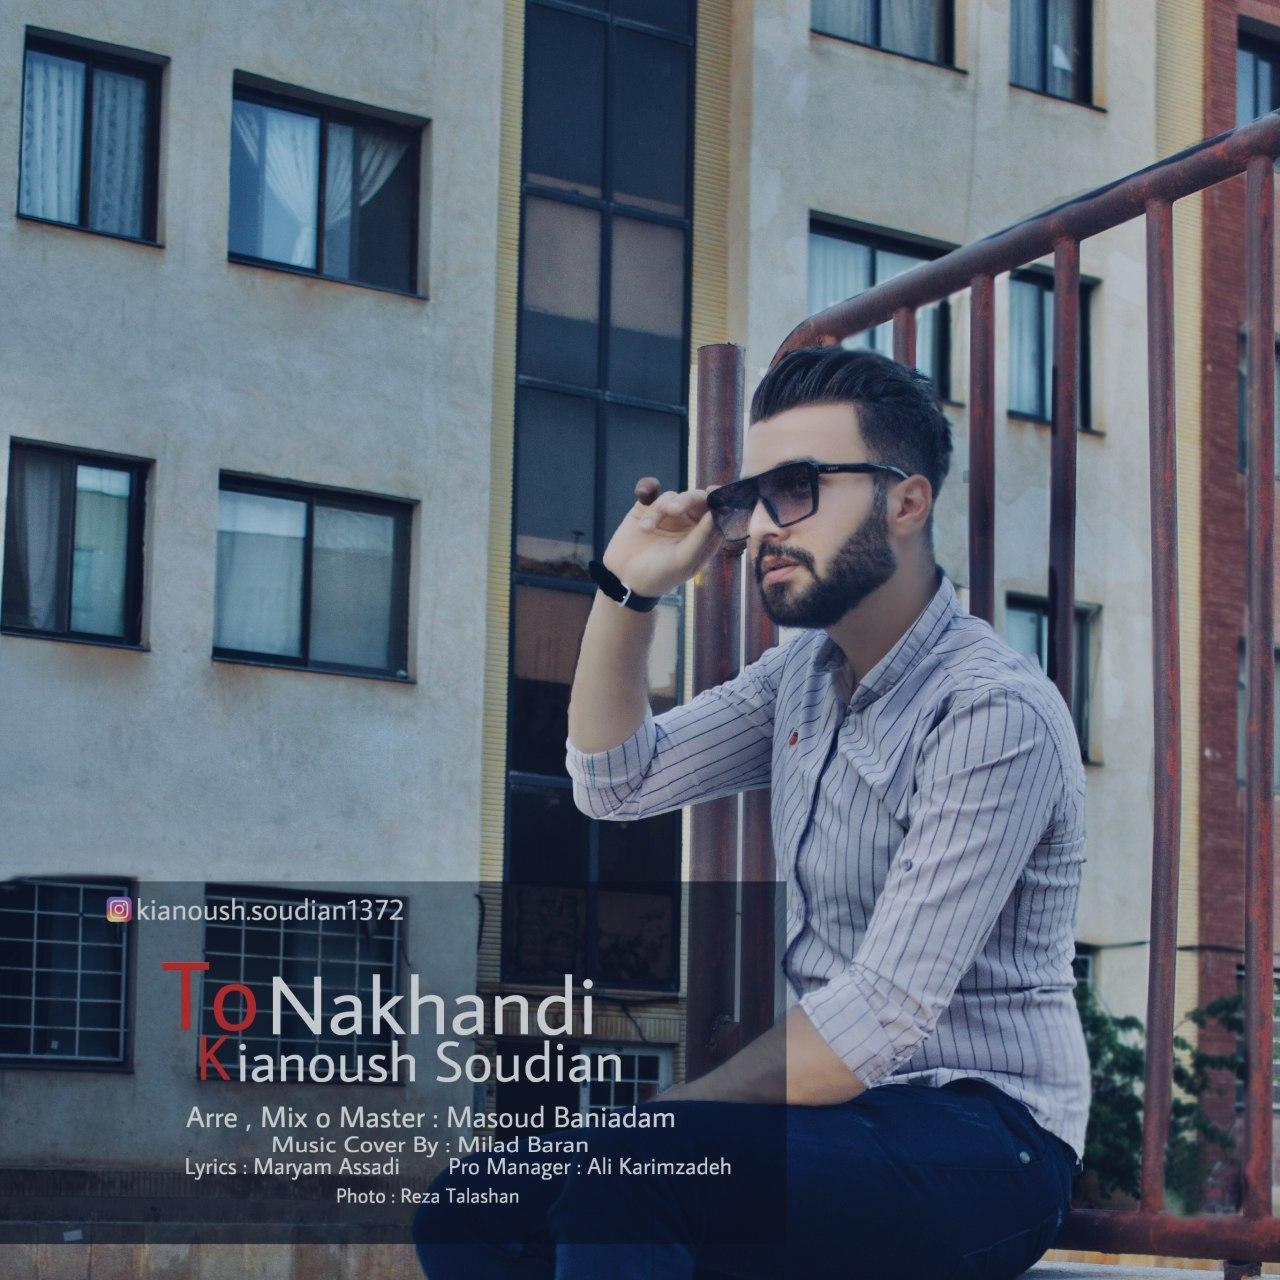 Kianoush Soudian – To Nakhandi